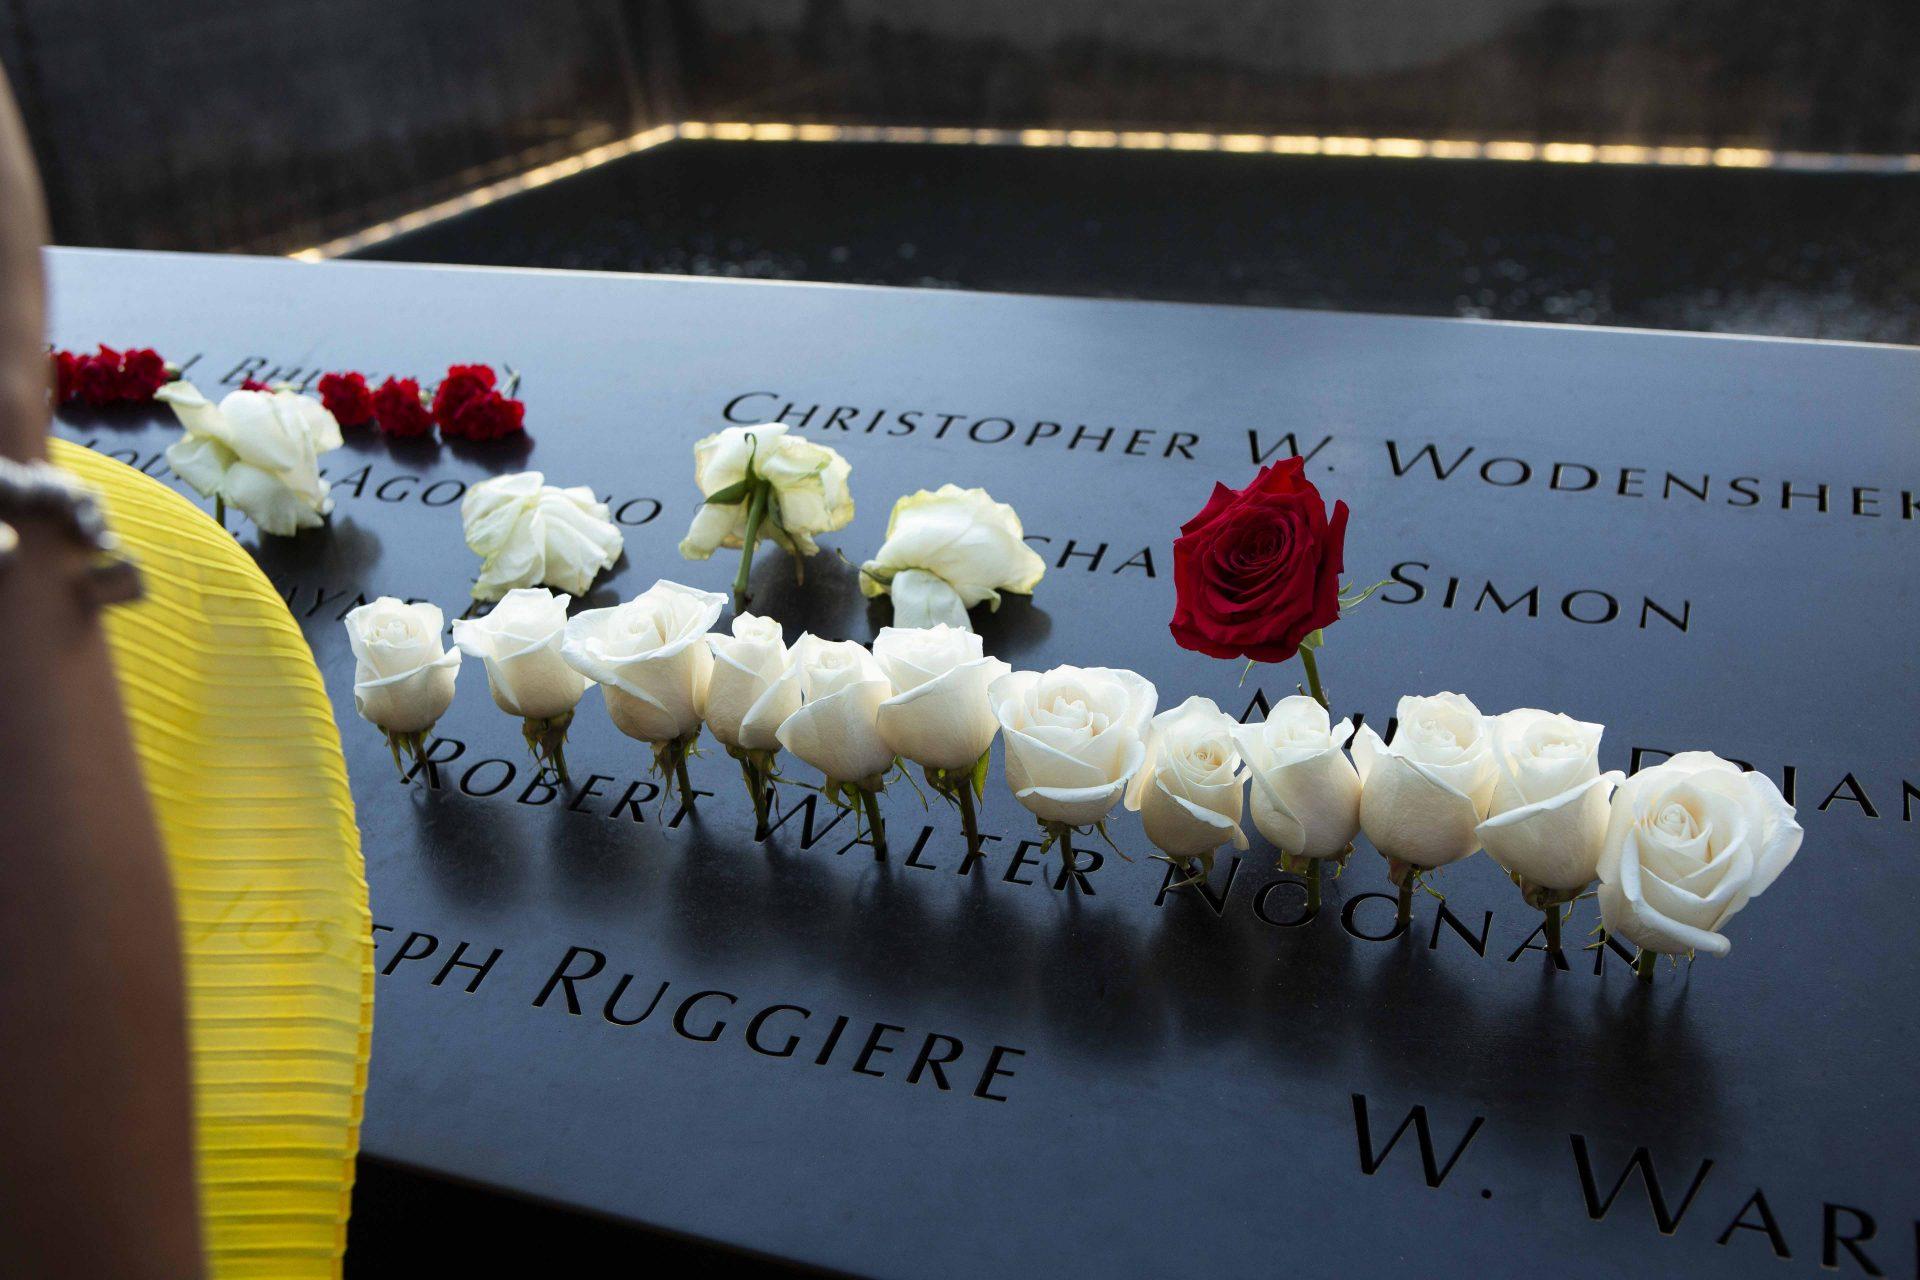 The National September 11 Memorial. (Image Credit: Hermann Rohr/ Vision Times)